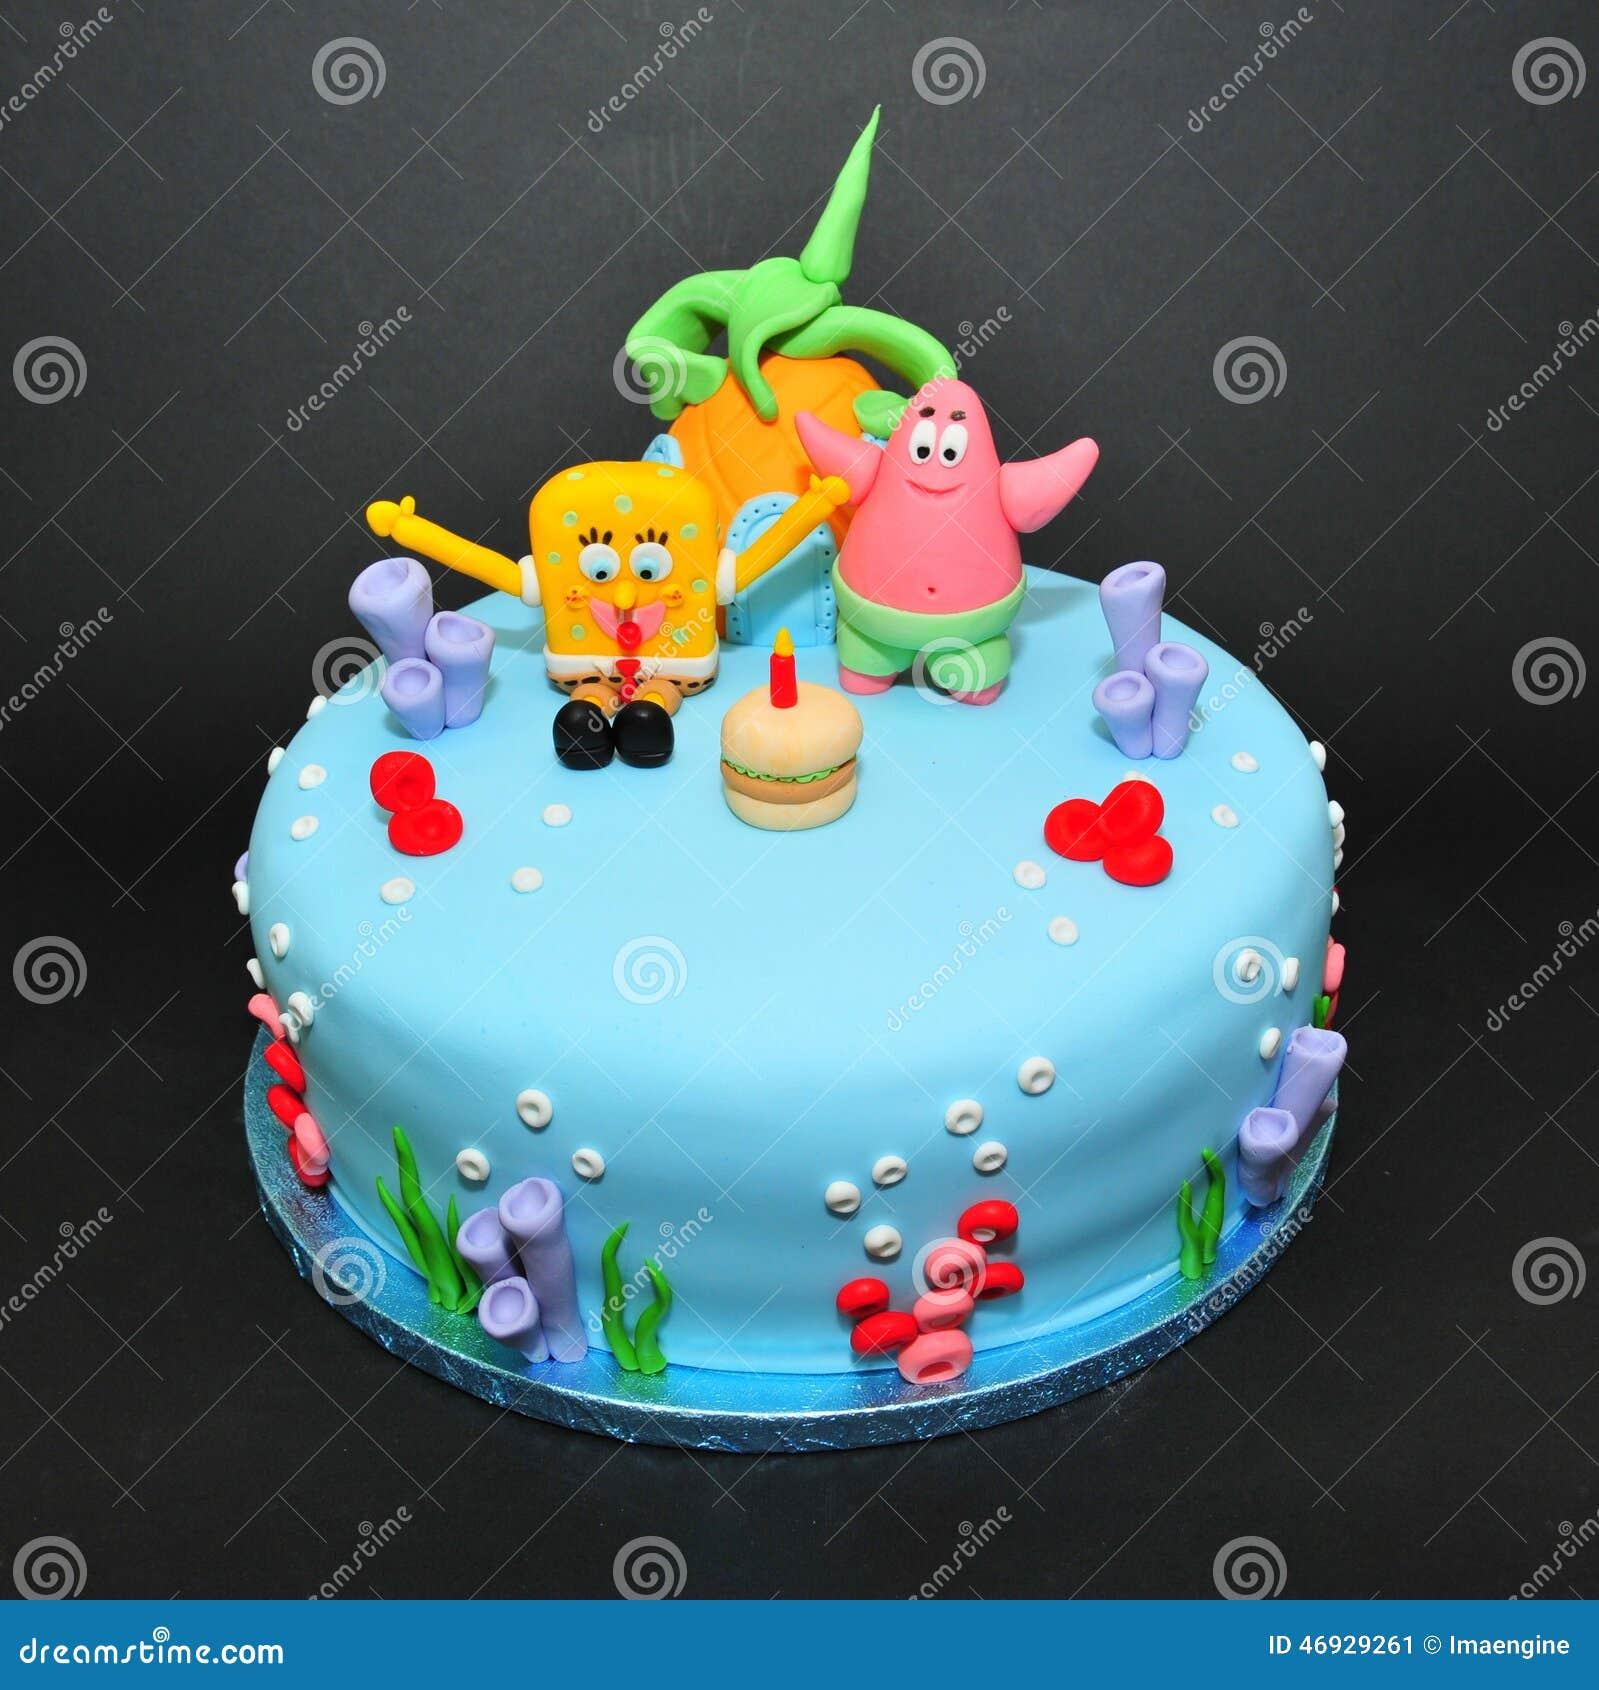 Spongebob Cookie Cake